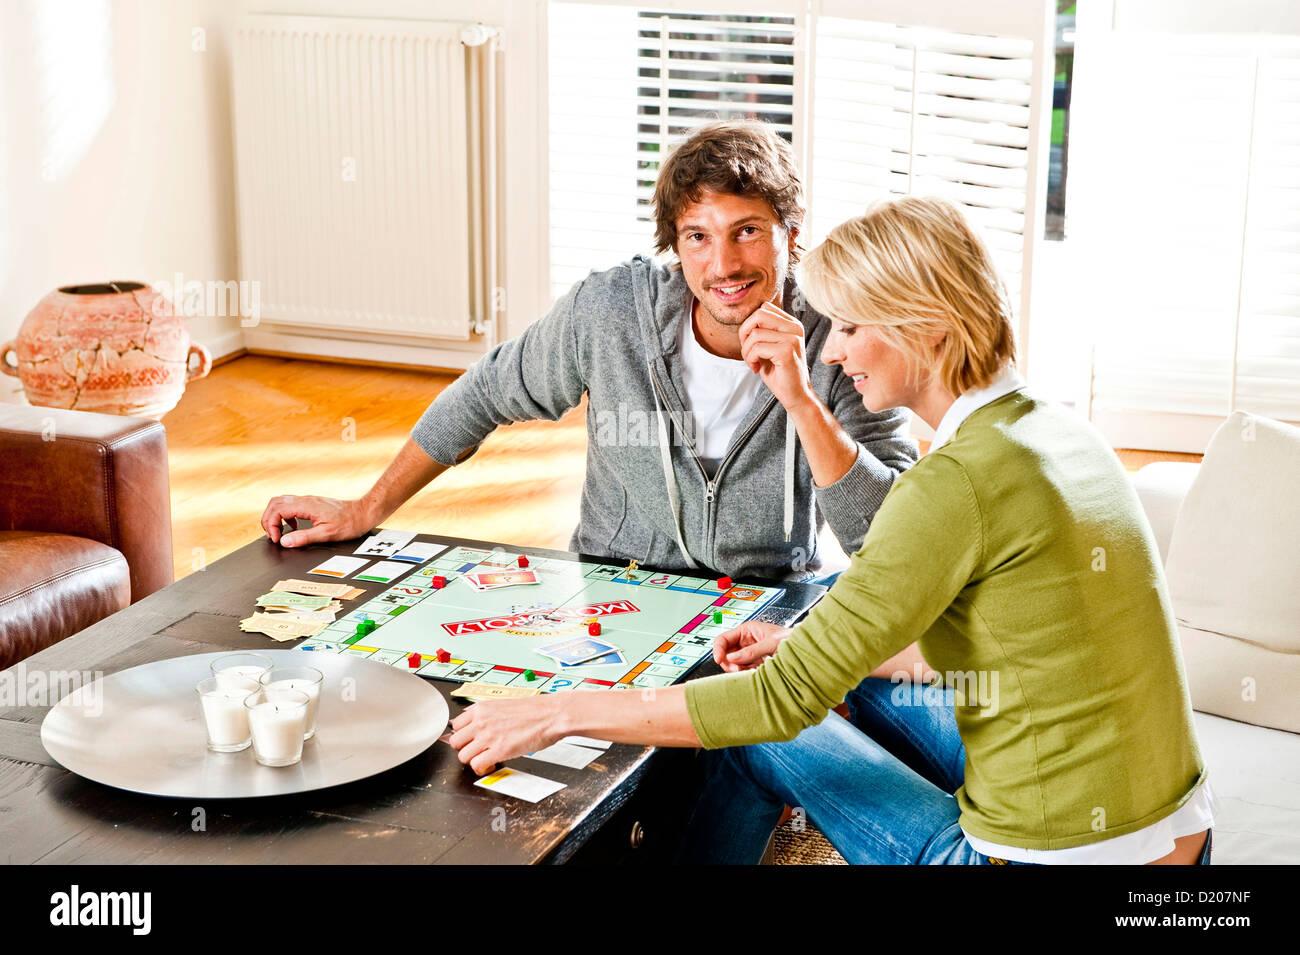 Young couple playing monopoly, Hamburg, Germany - Stock Image